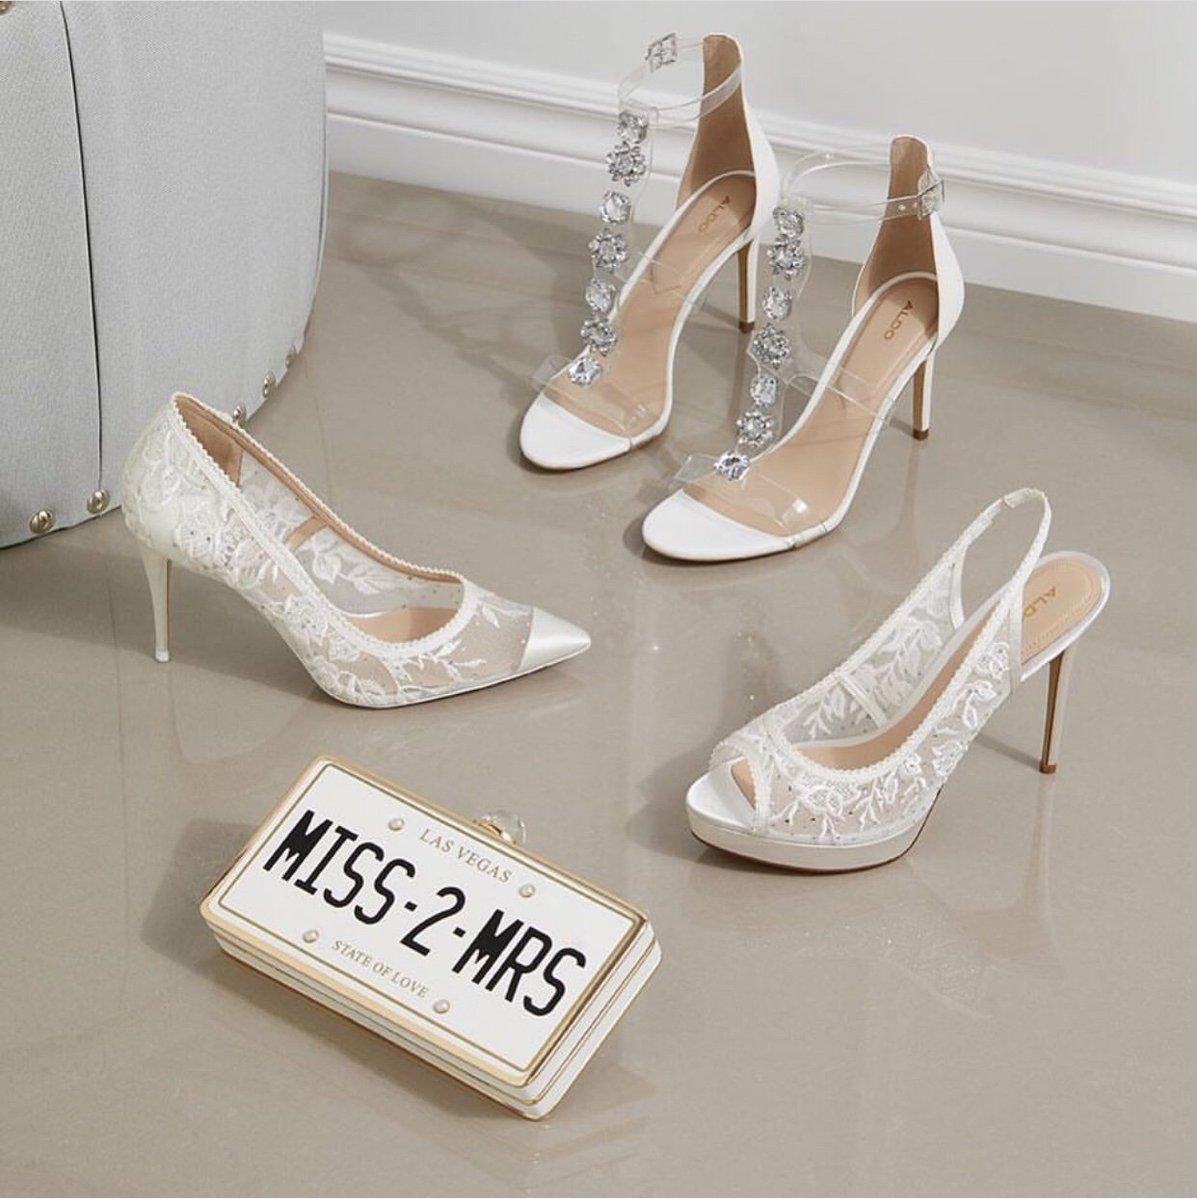 a232c46690f3 Make a stylish entry at your wedding in gorgeous bridal footwear! Swipe to  see more! @Aprajitatoor #christianlouboutin #jimmychoo #aprajitatoor #aldo # shoes ...